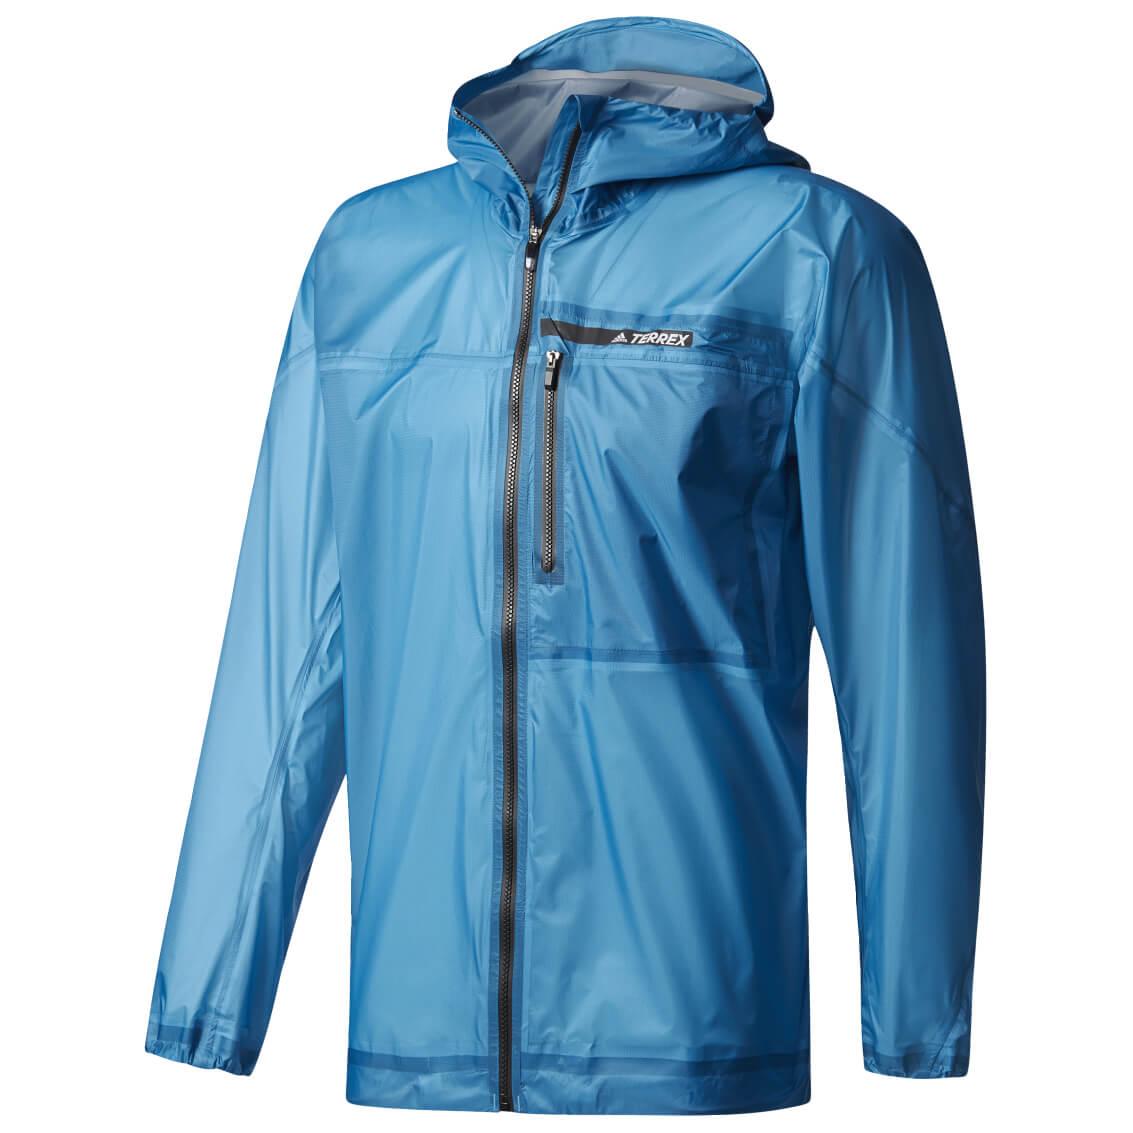 Adidas Terrex Agravic 3L Jacket Hardshelljacke